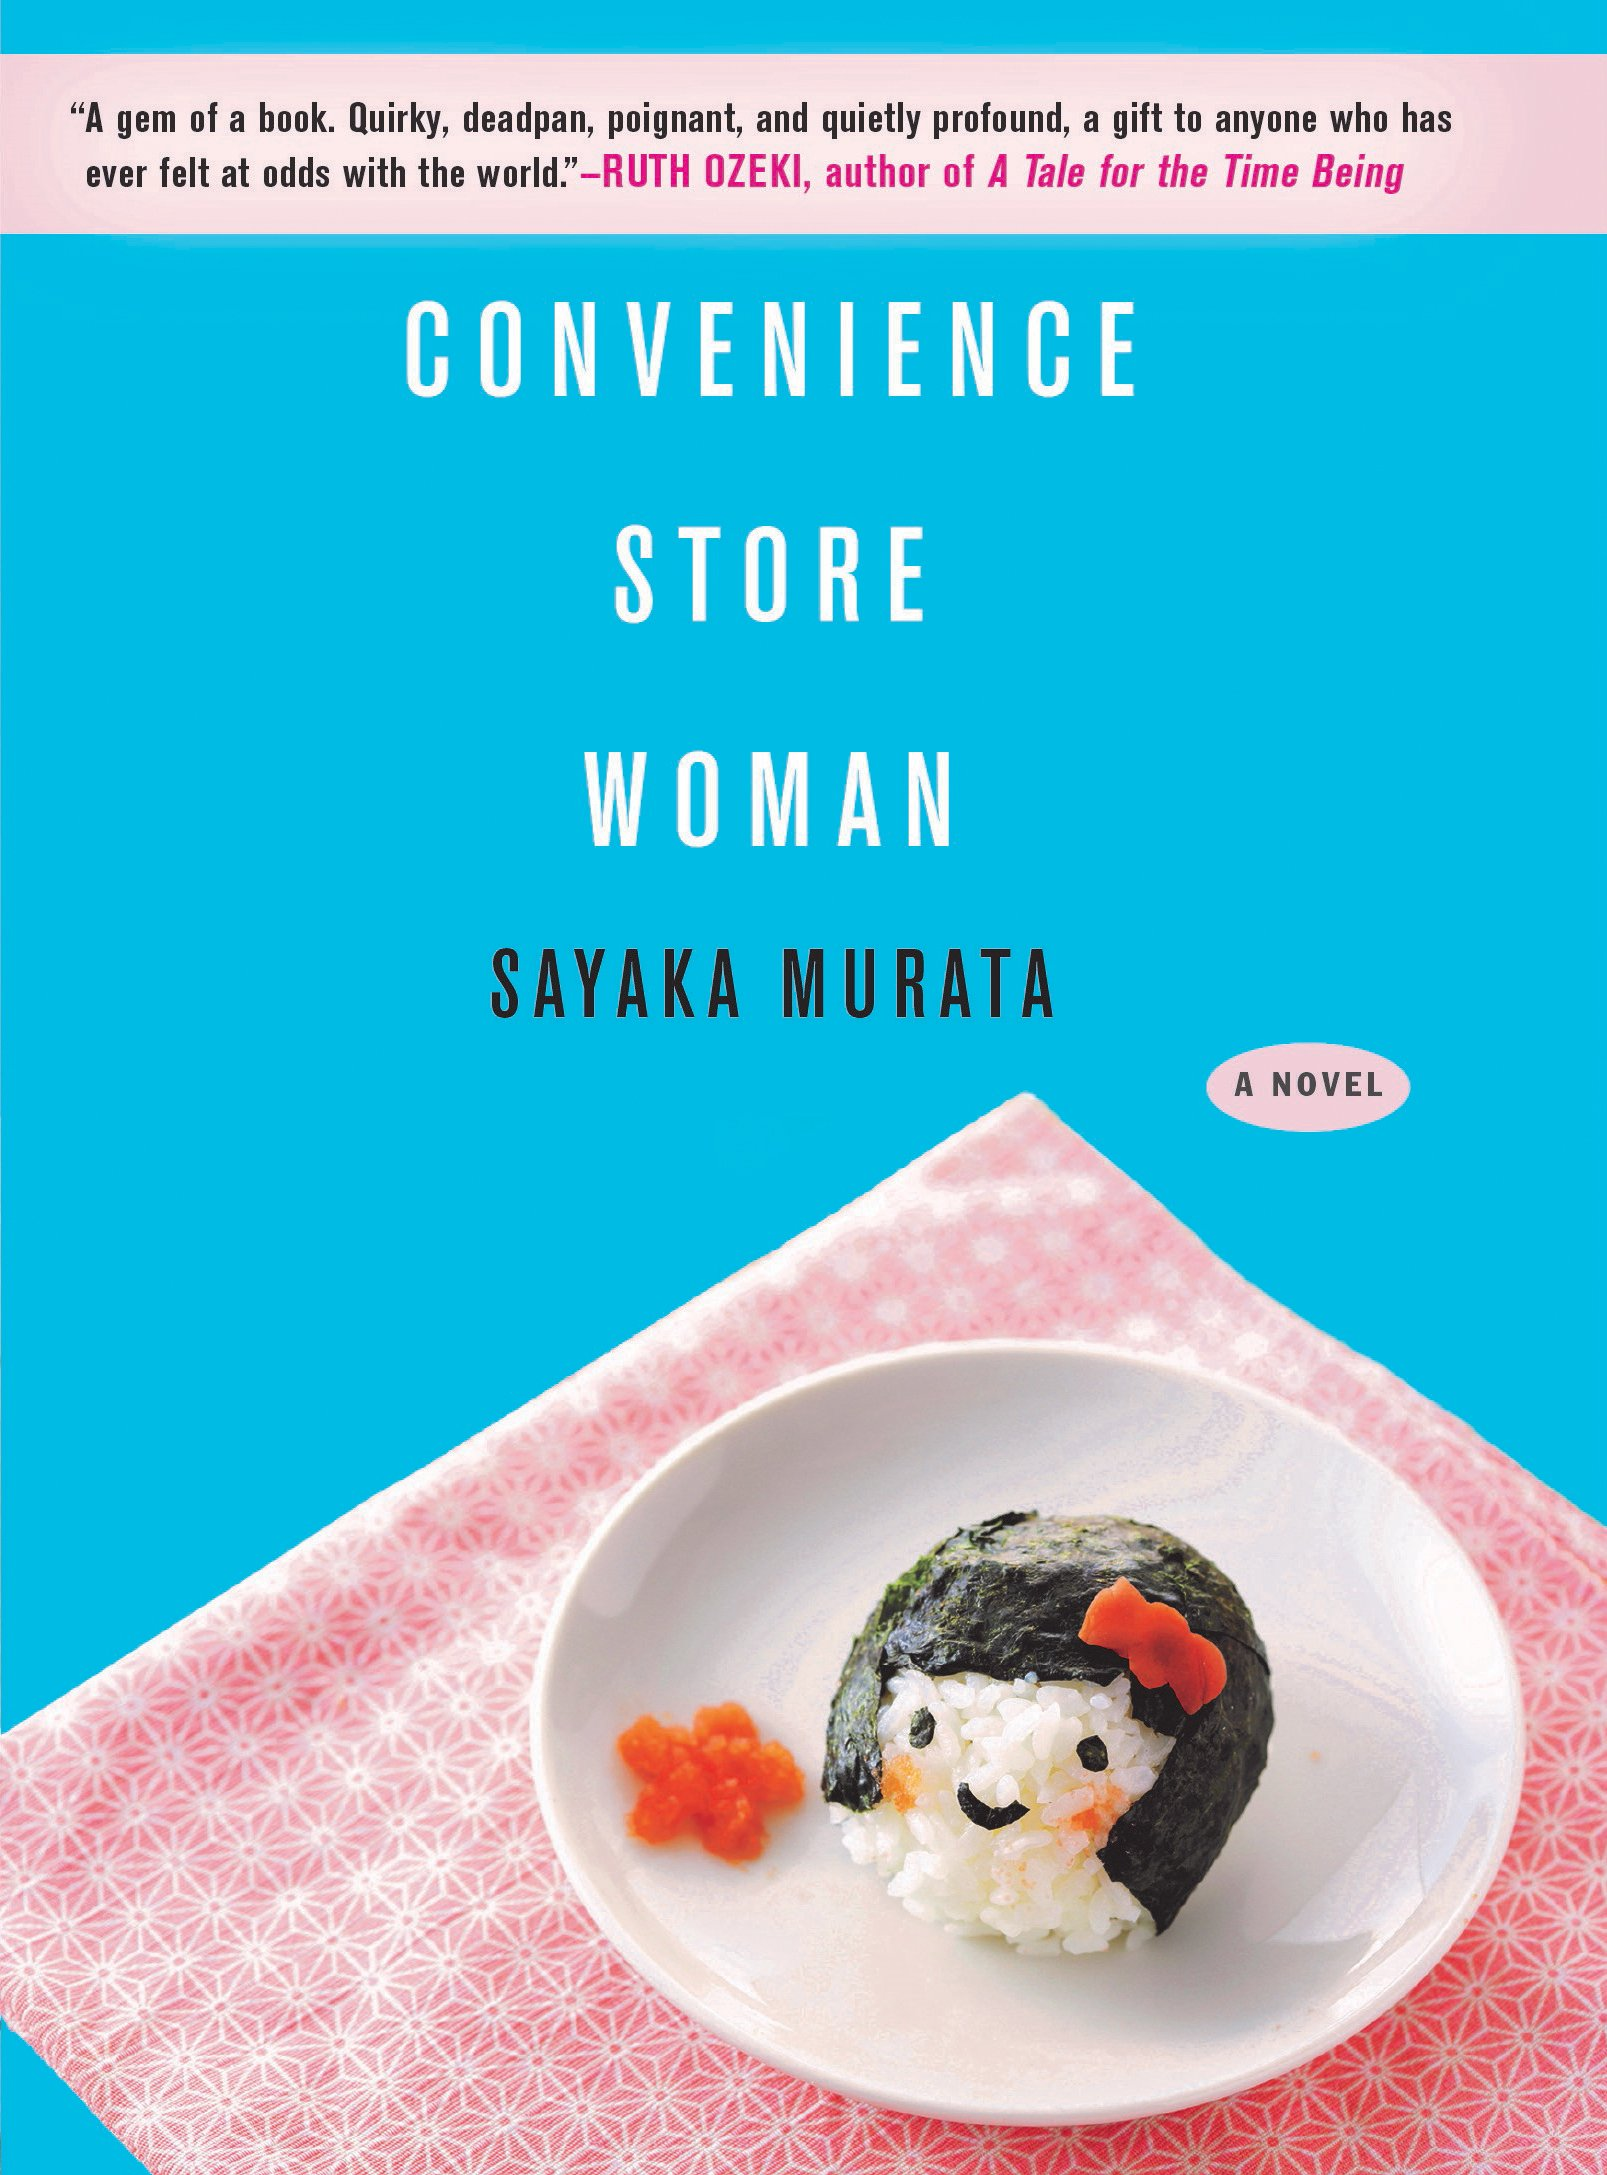 Convenience Store Woman by Sayaka Murata, Ginny Tapley Takemori (Translator)